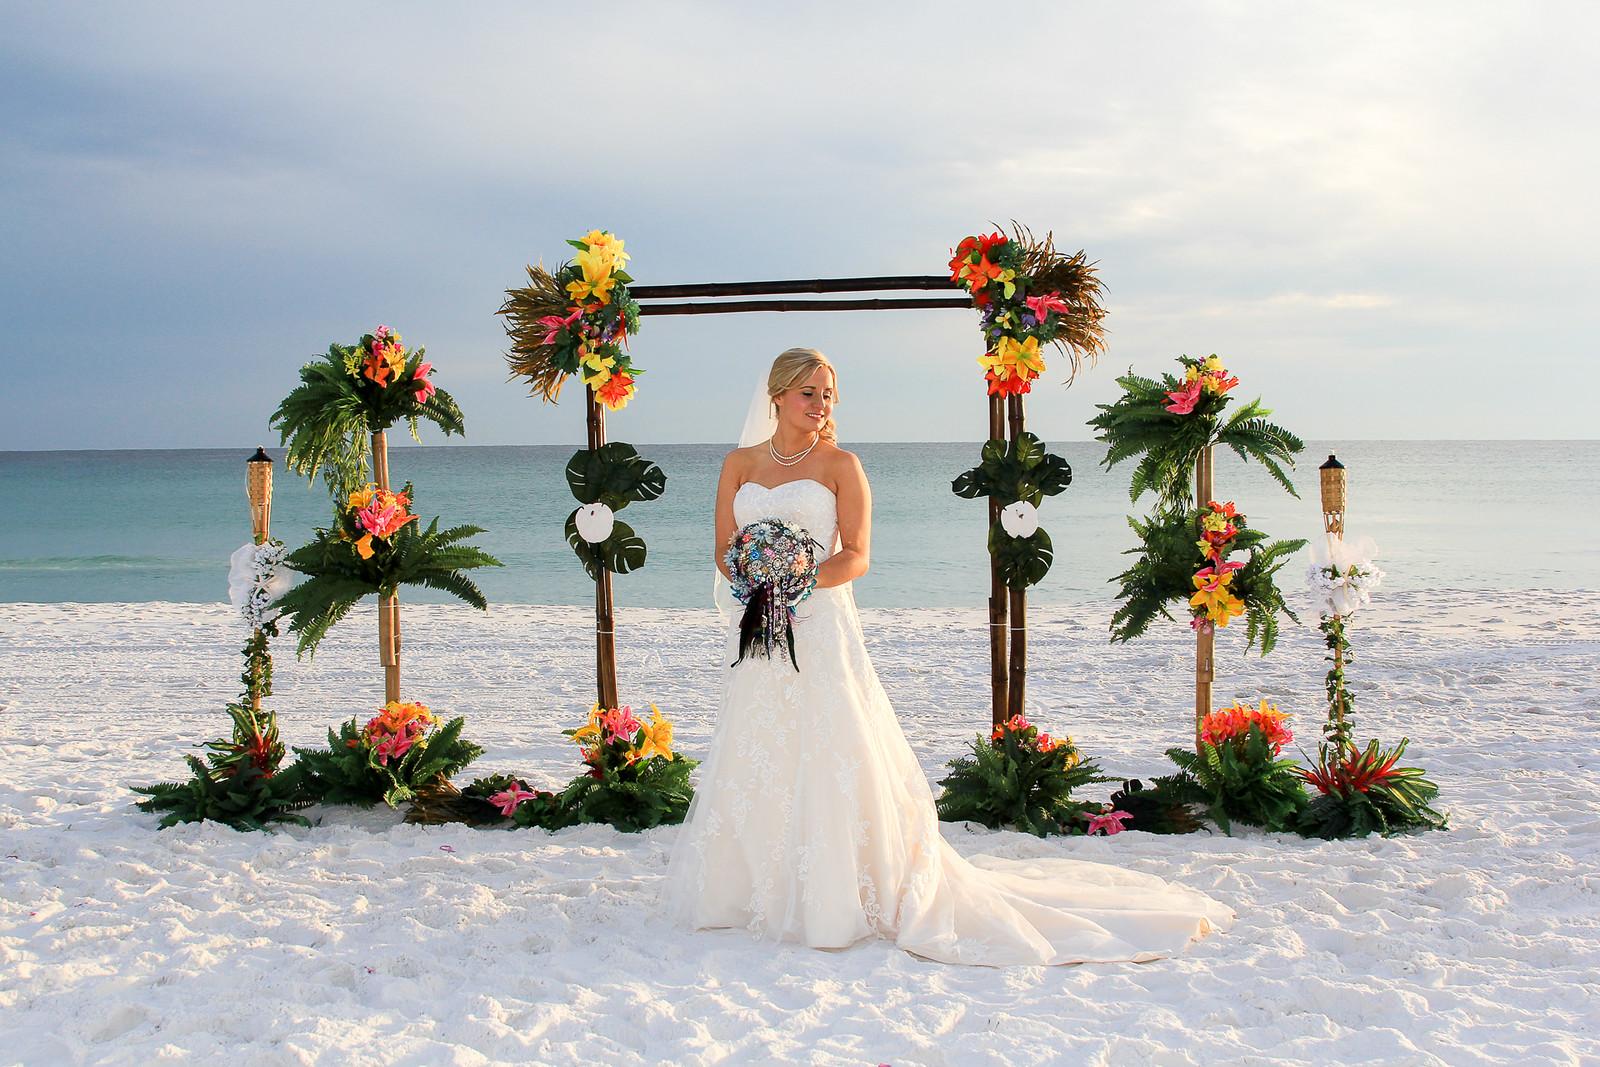 Destin Beach Wedding Locations